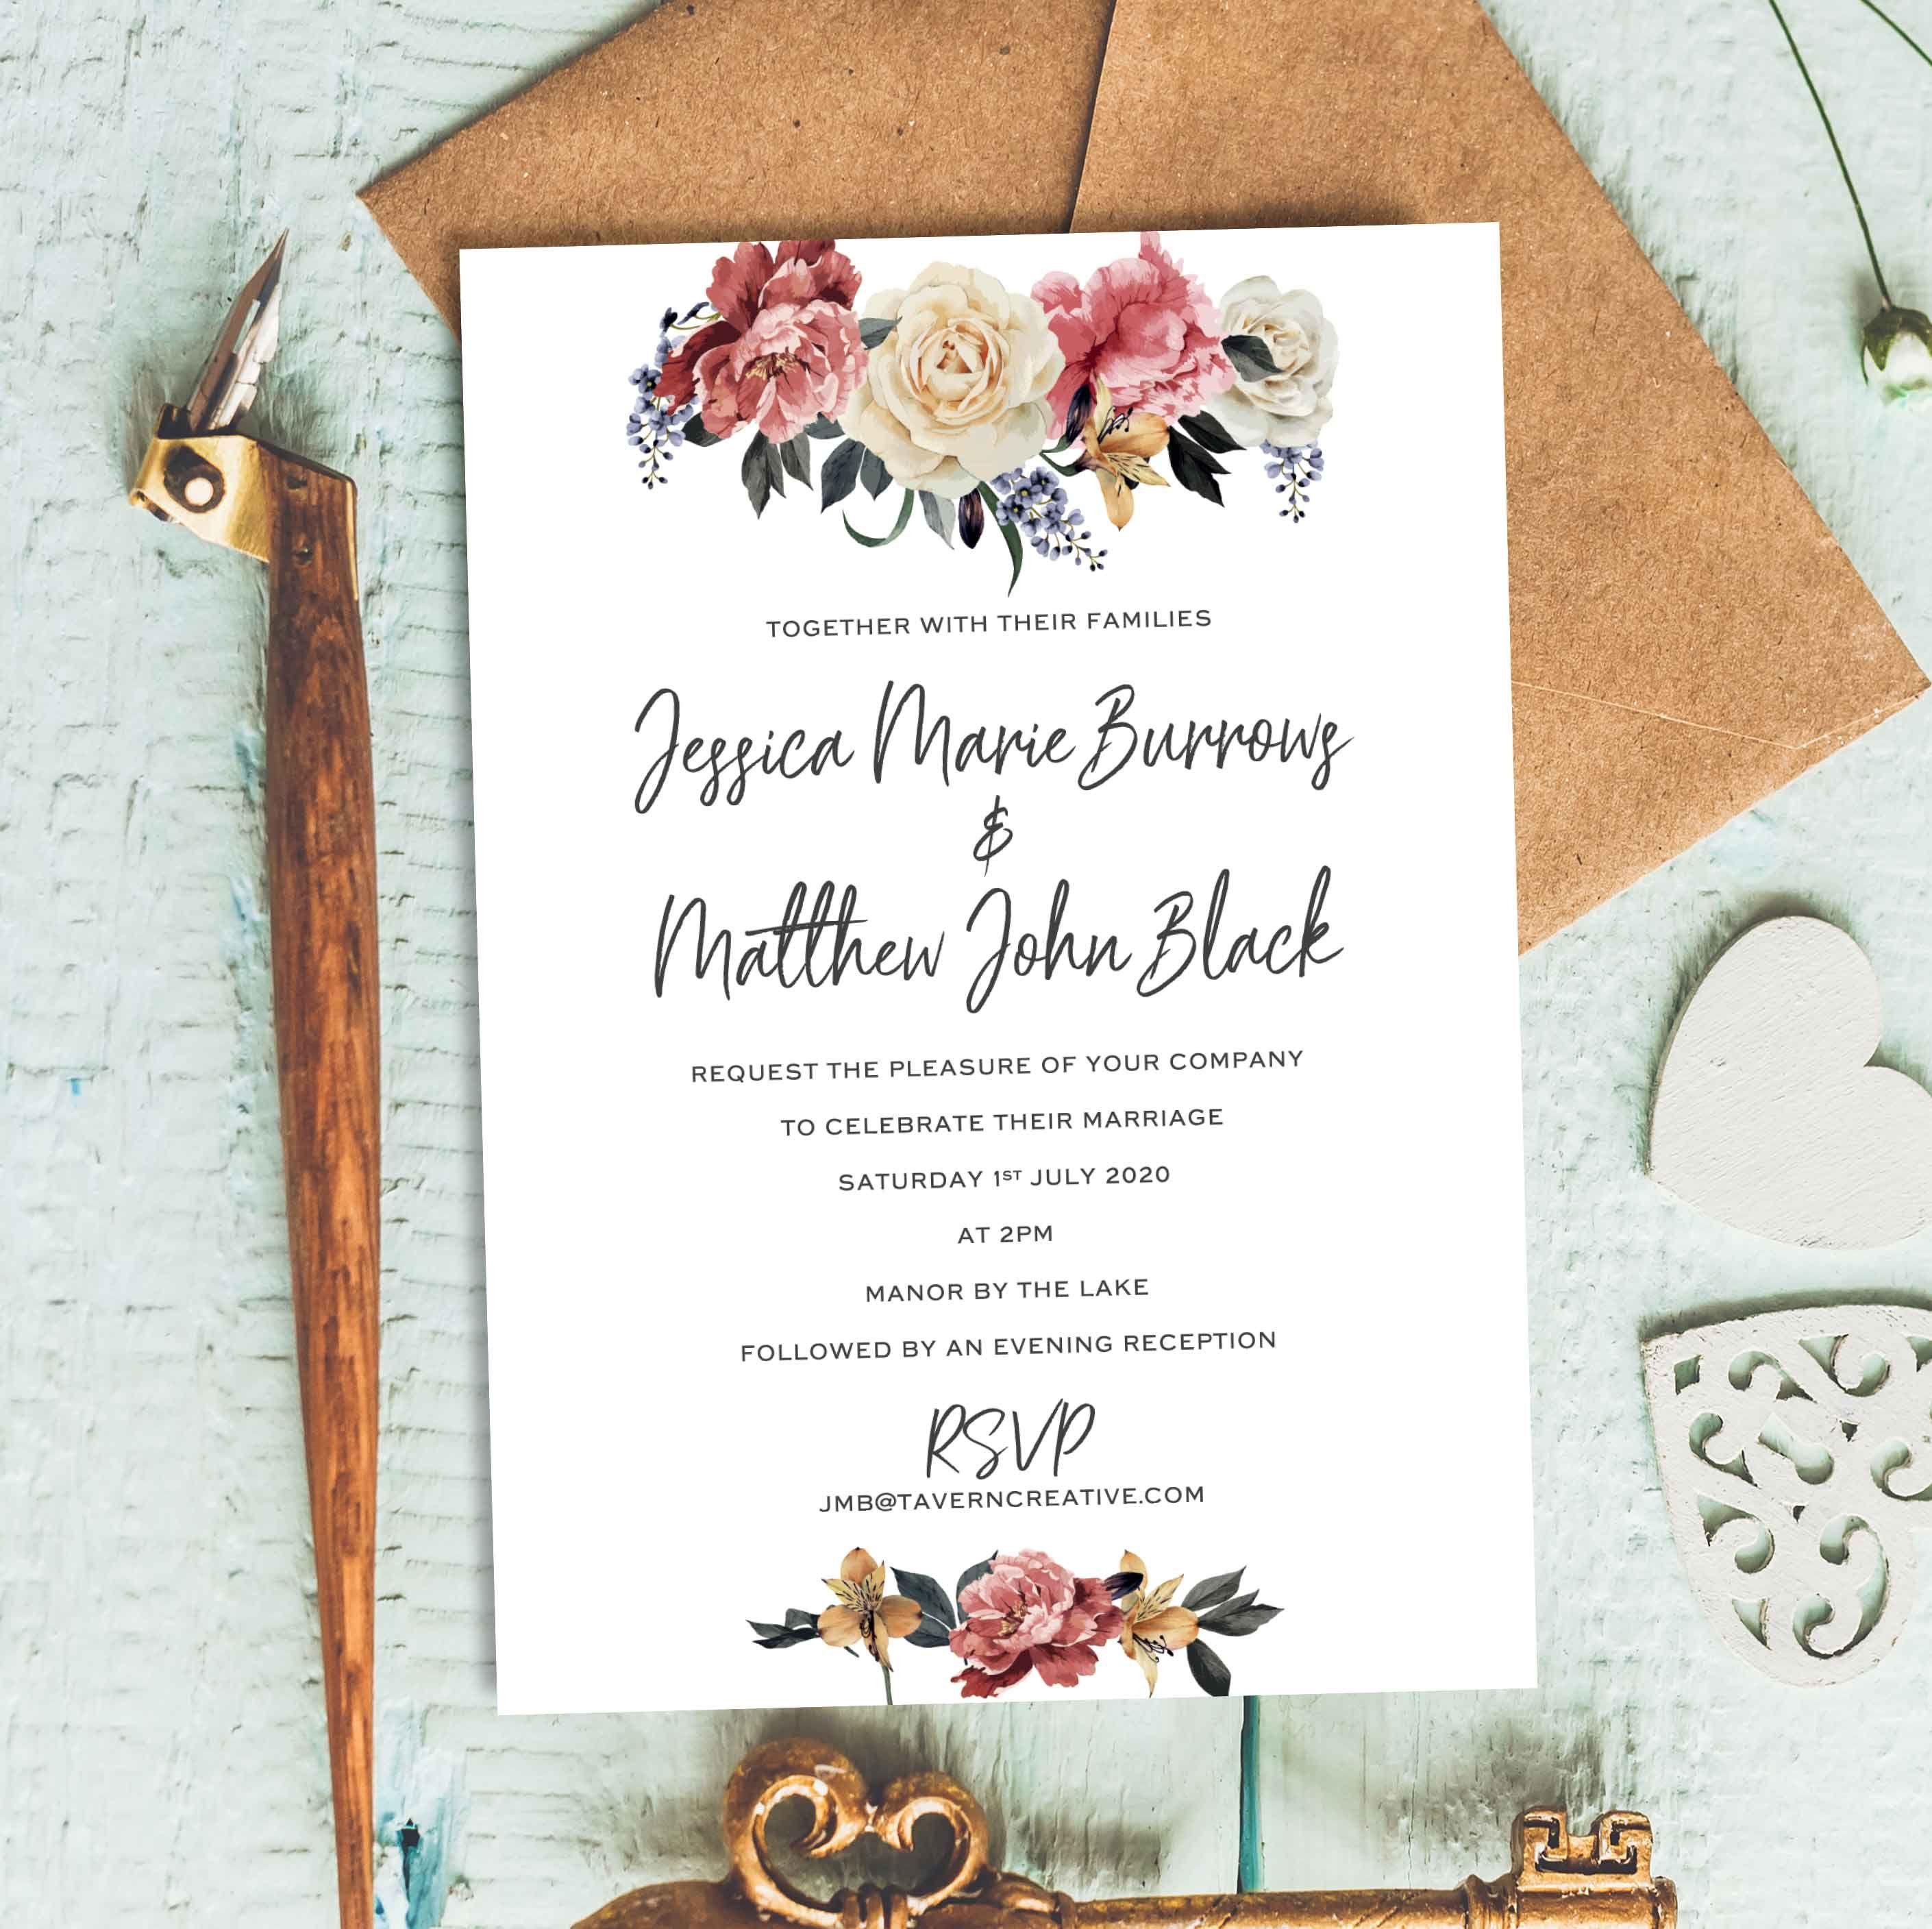 Wedding Invitations Indian Pinterest Ideas 2019 Floral Wedding Invitations Wedding Invitations Unique Wedding Invitations